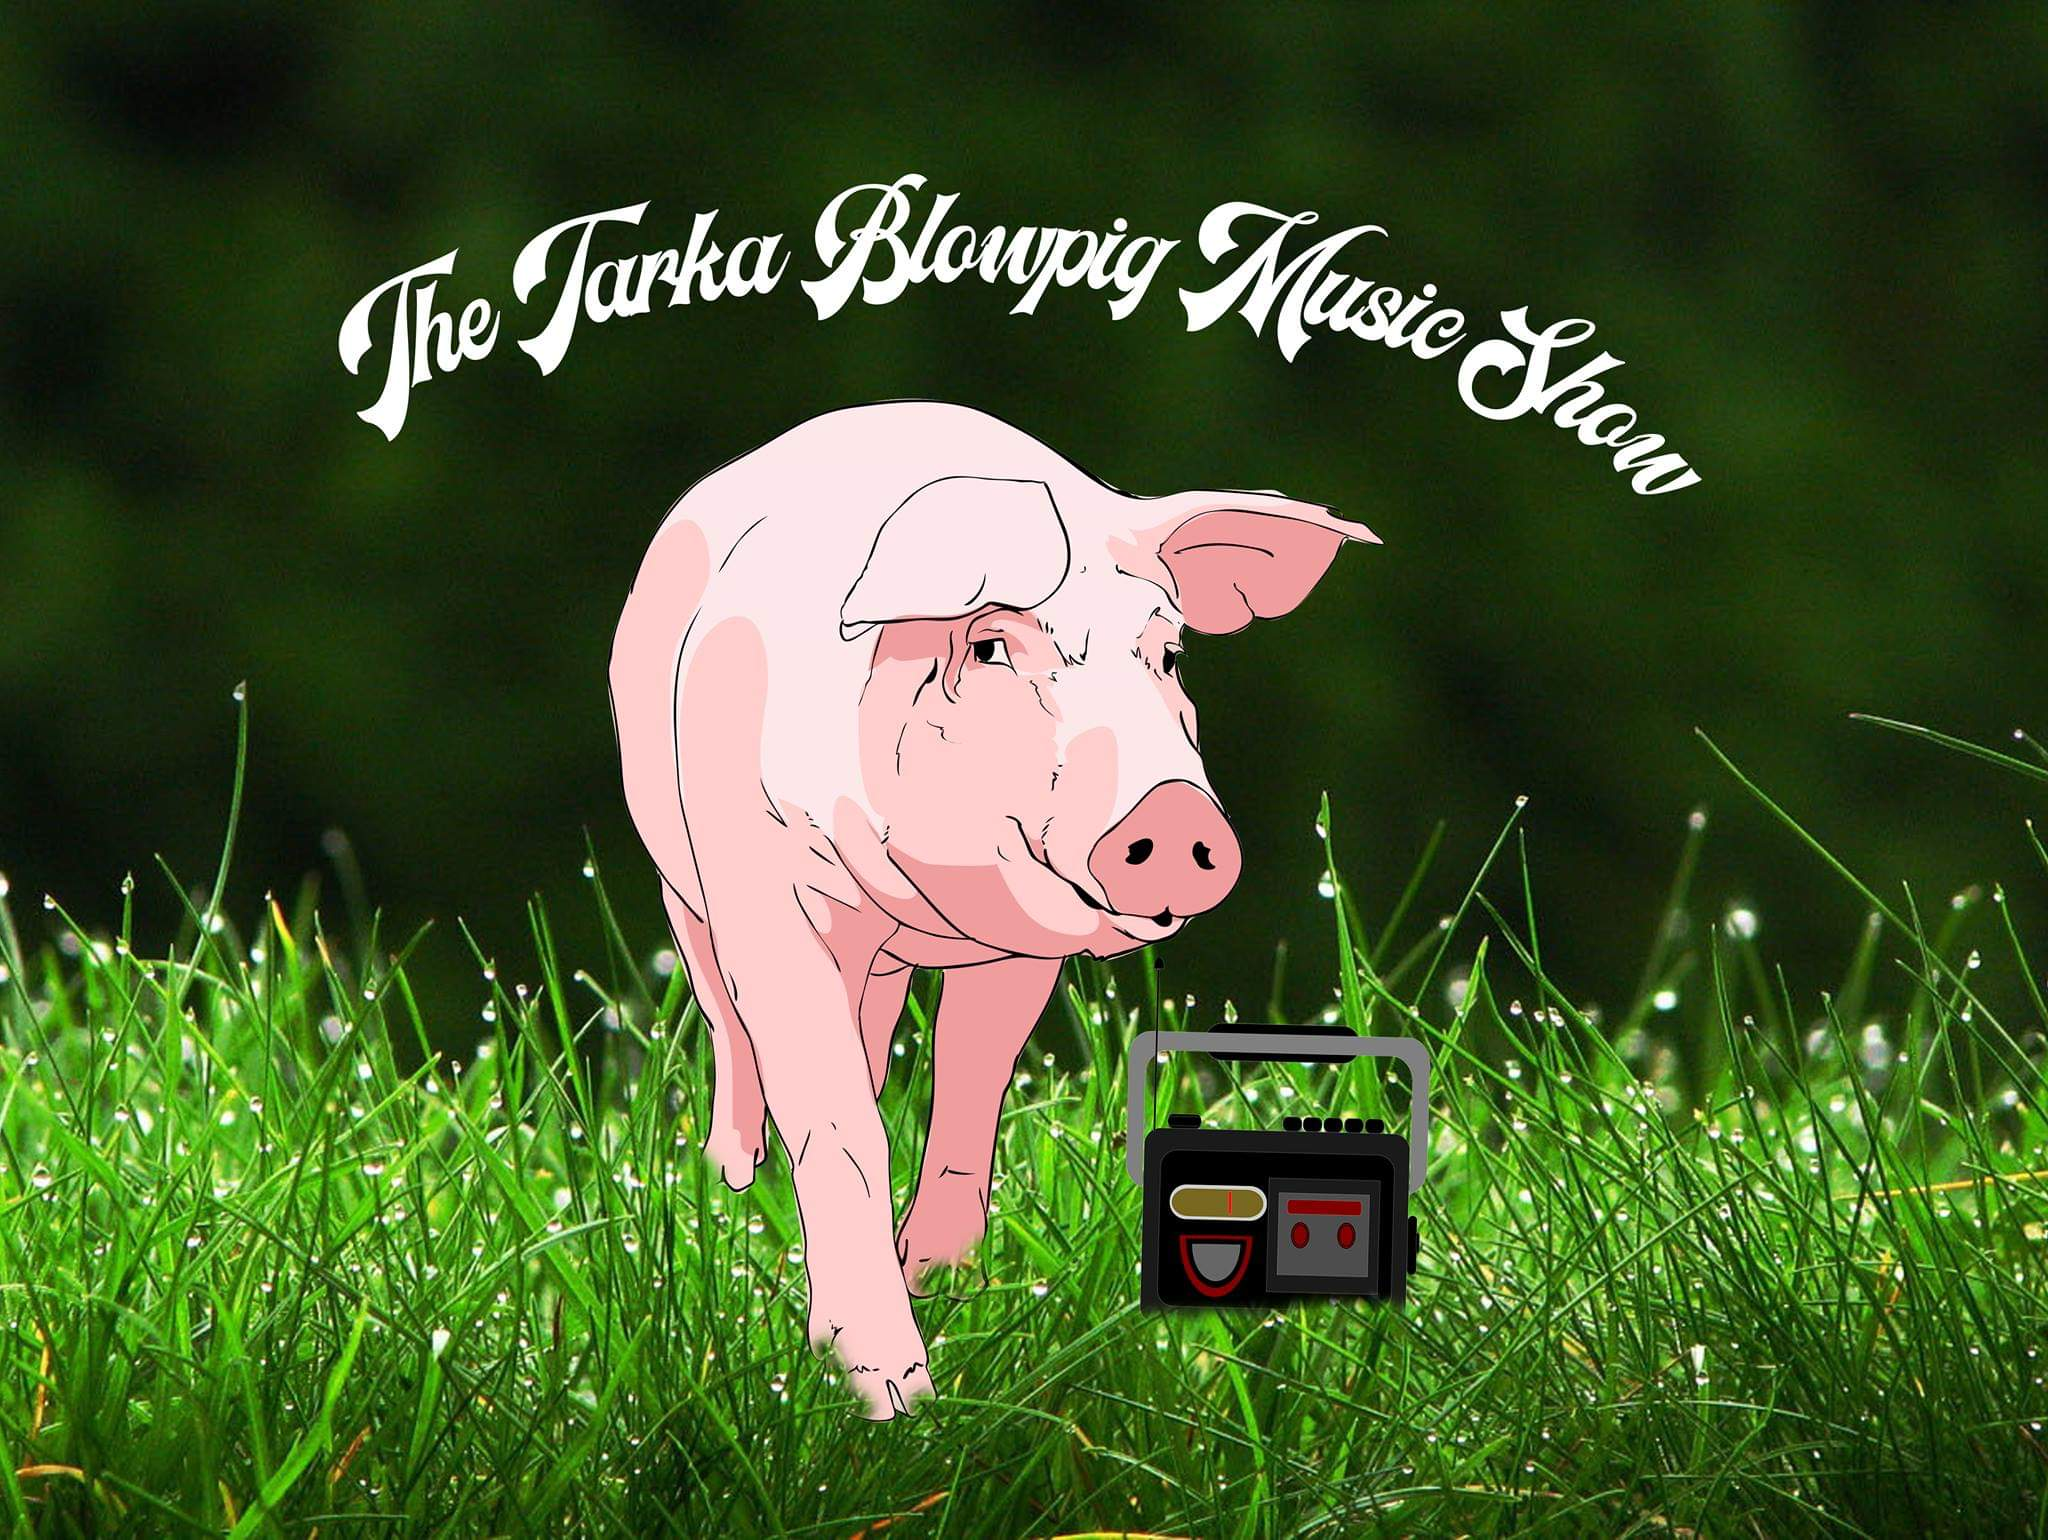 The Tarka Blowpig Music Show